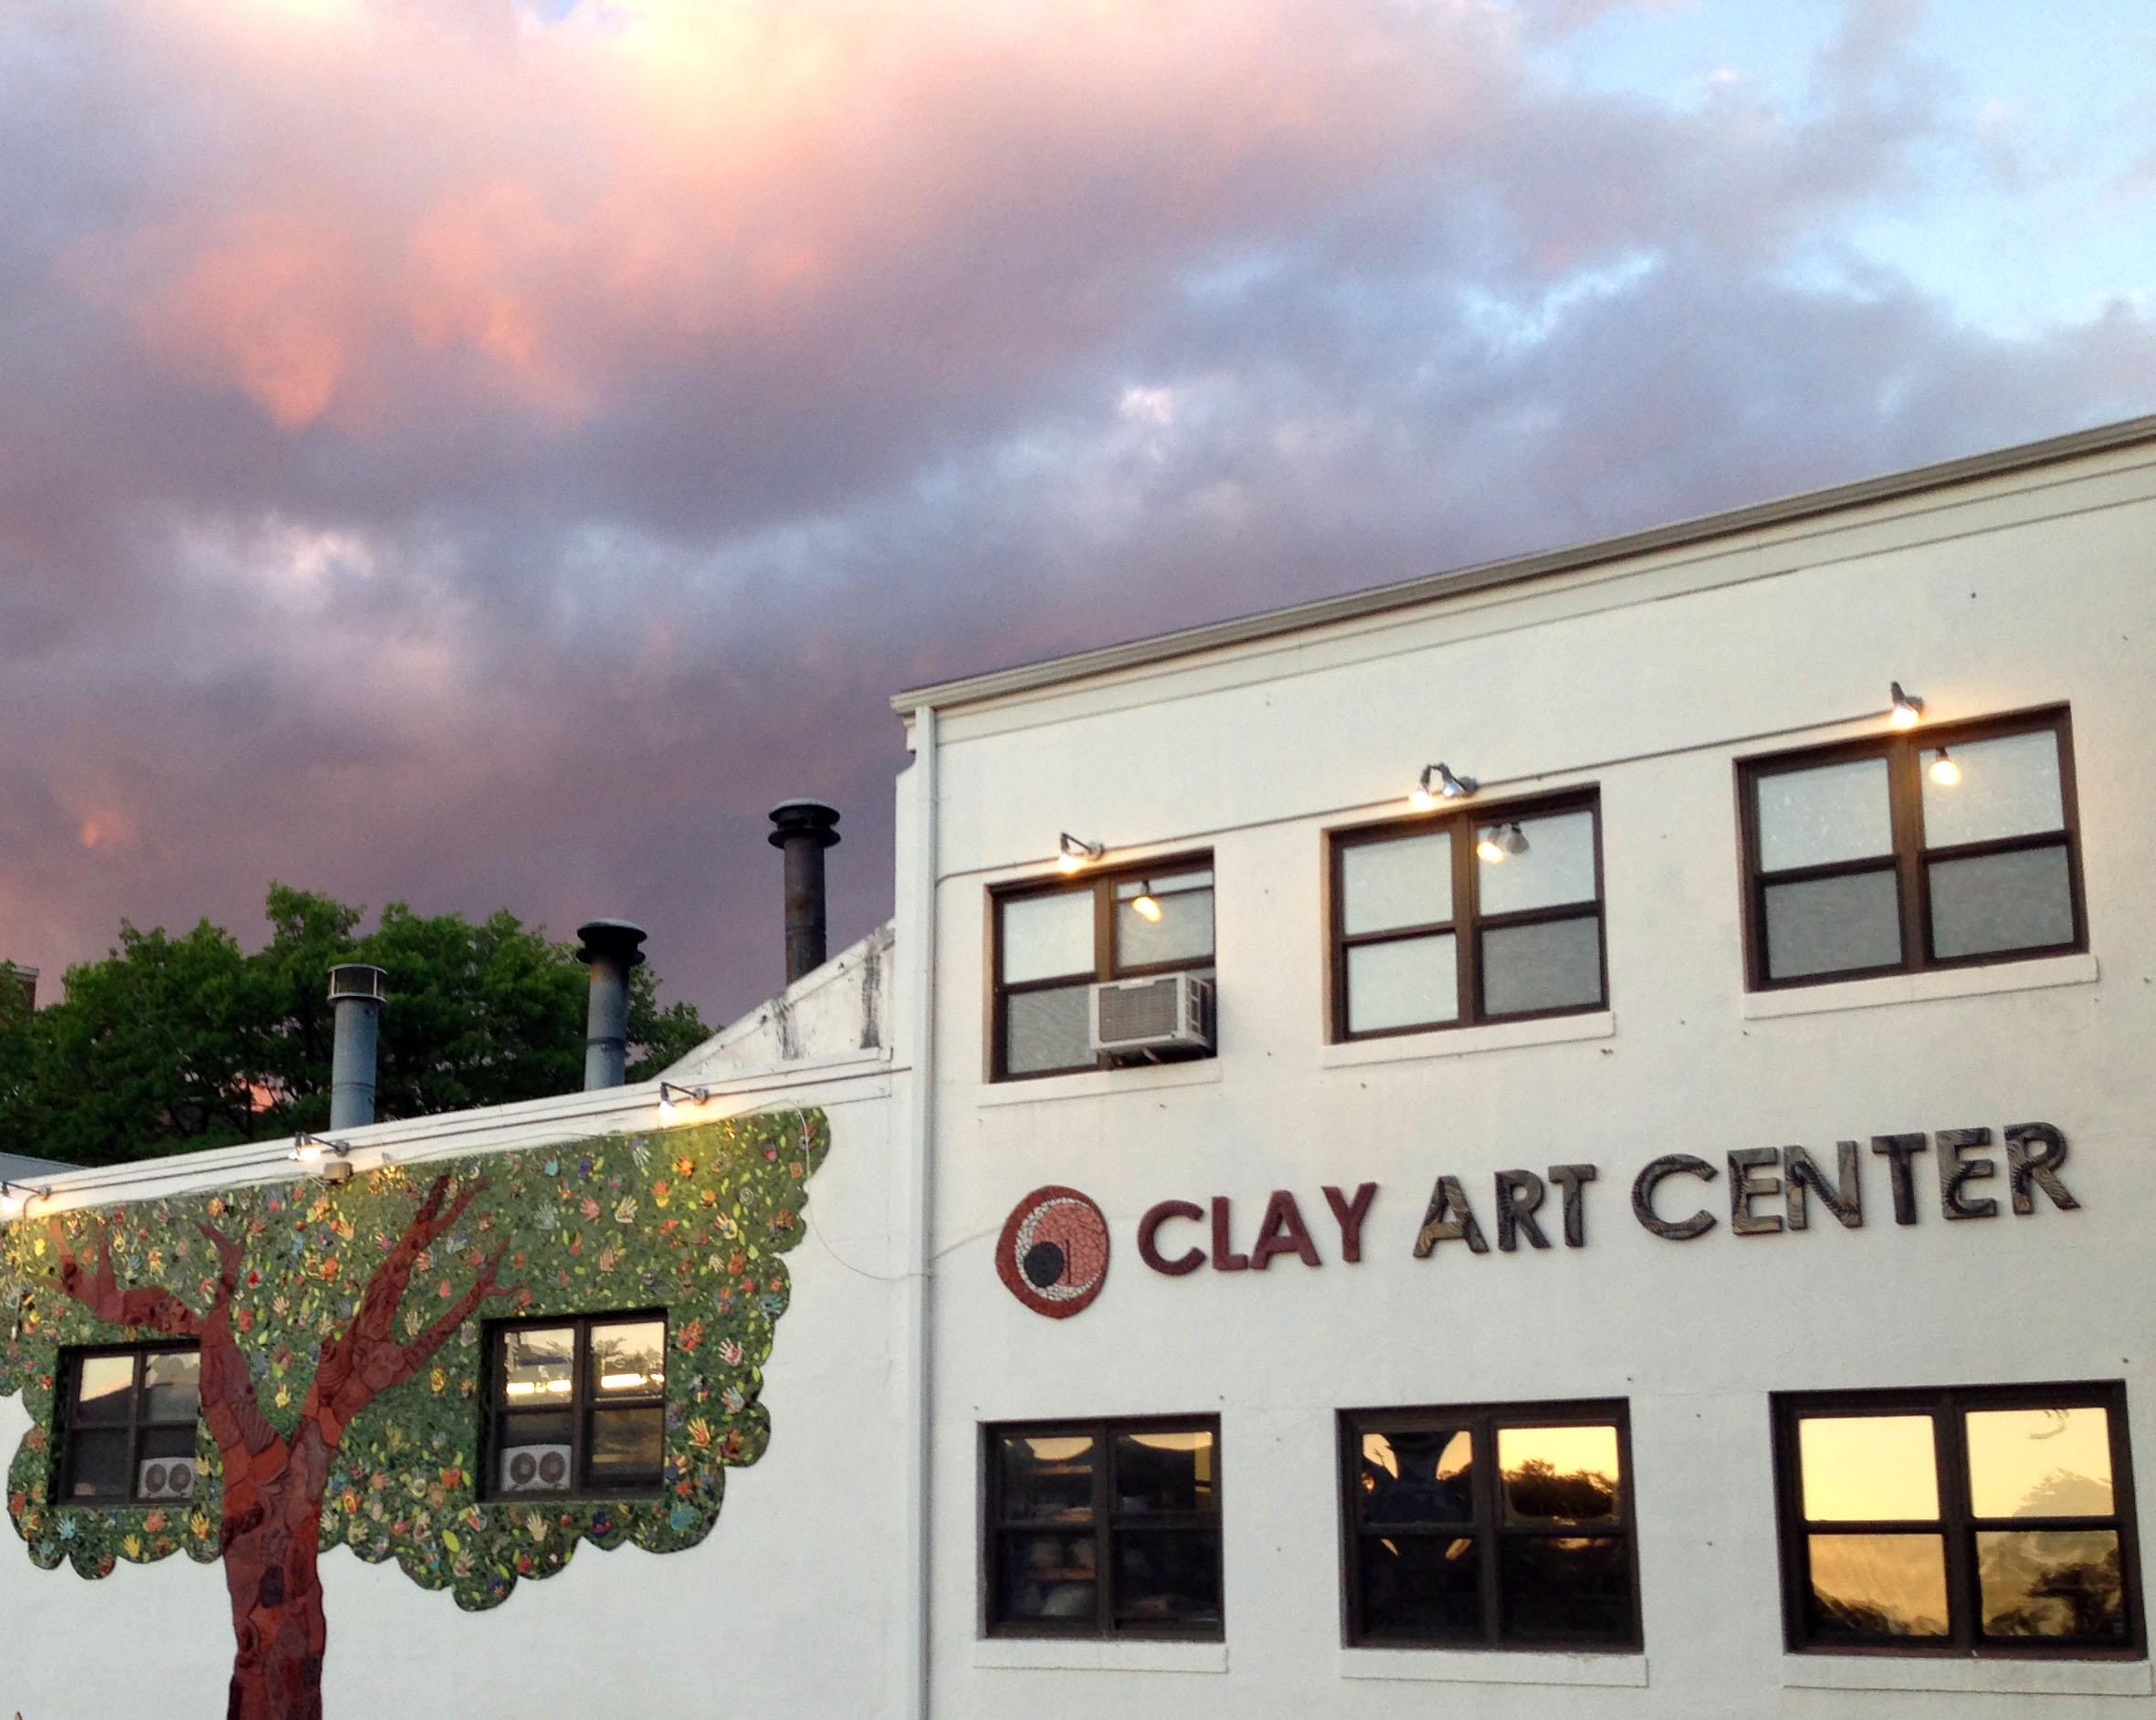 Clay Art Center Mural at Sunset